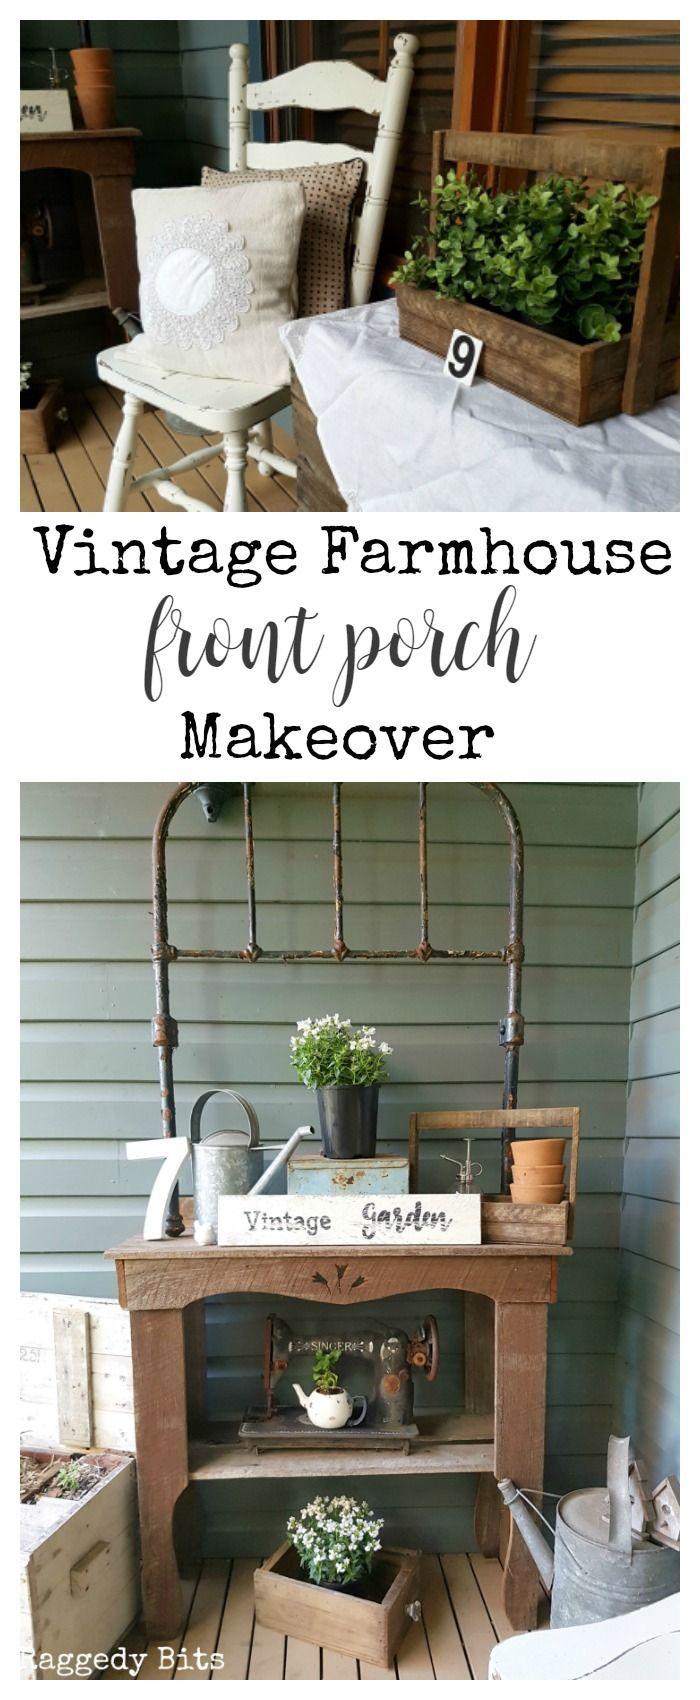 Sharing our fun Vintage Farmhouse Garden Tour that won't break the bank | www.raggedy-bits.com